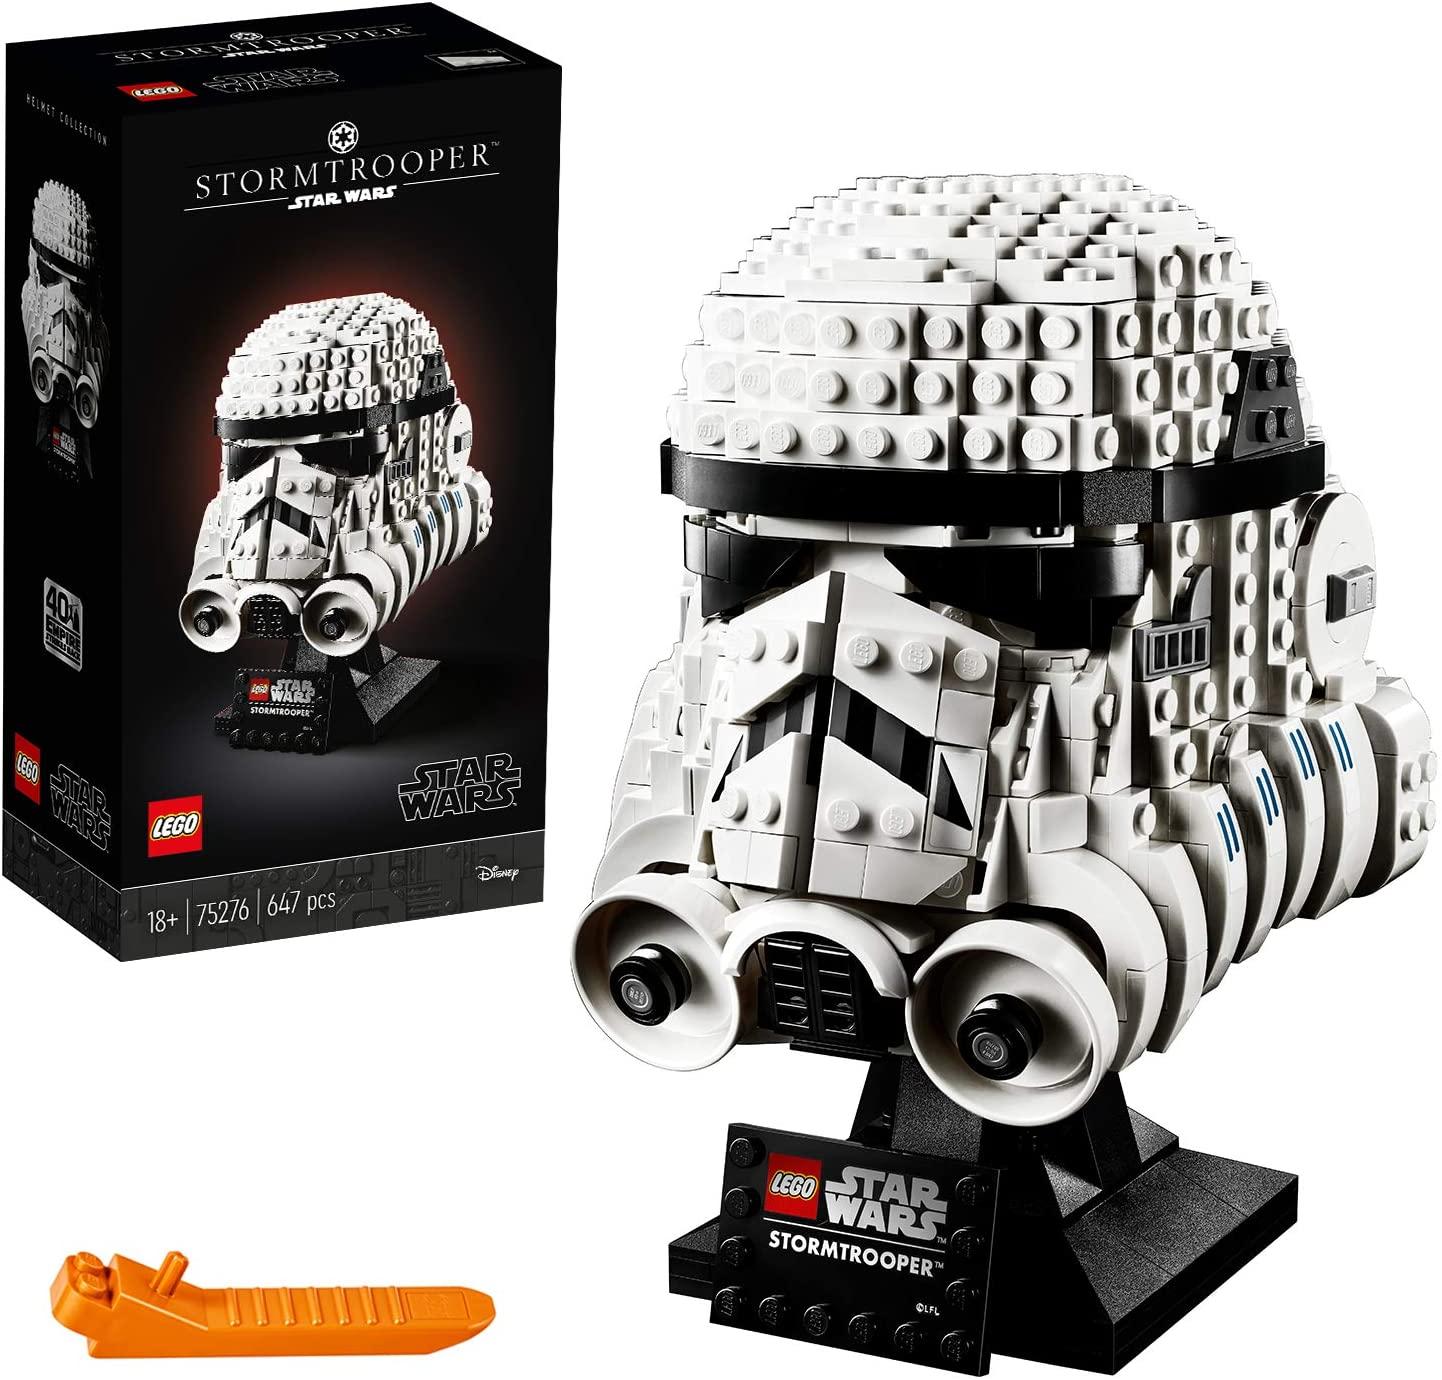 LEGO Star Wars 75276 Stormtrooper Helmet Display Building Set £39.99 Amazon Treasure Truck (Prime only)